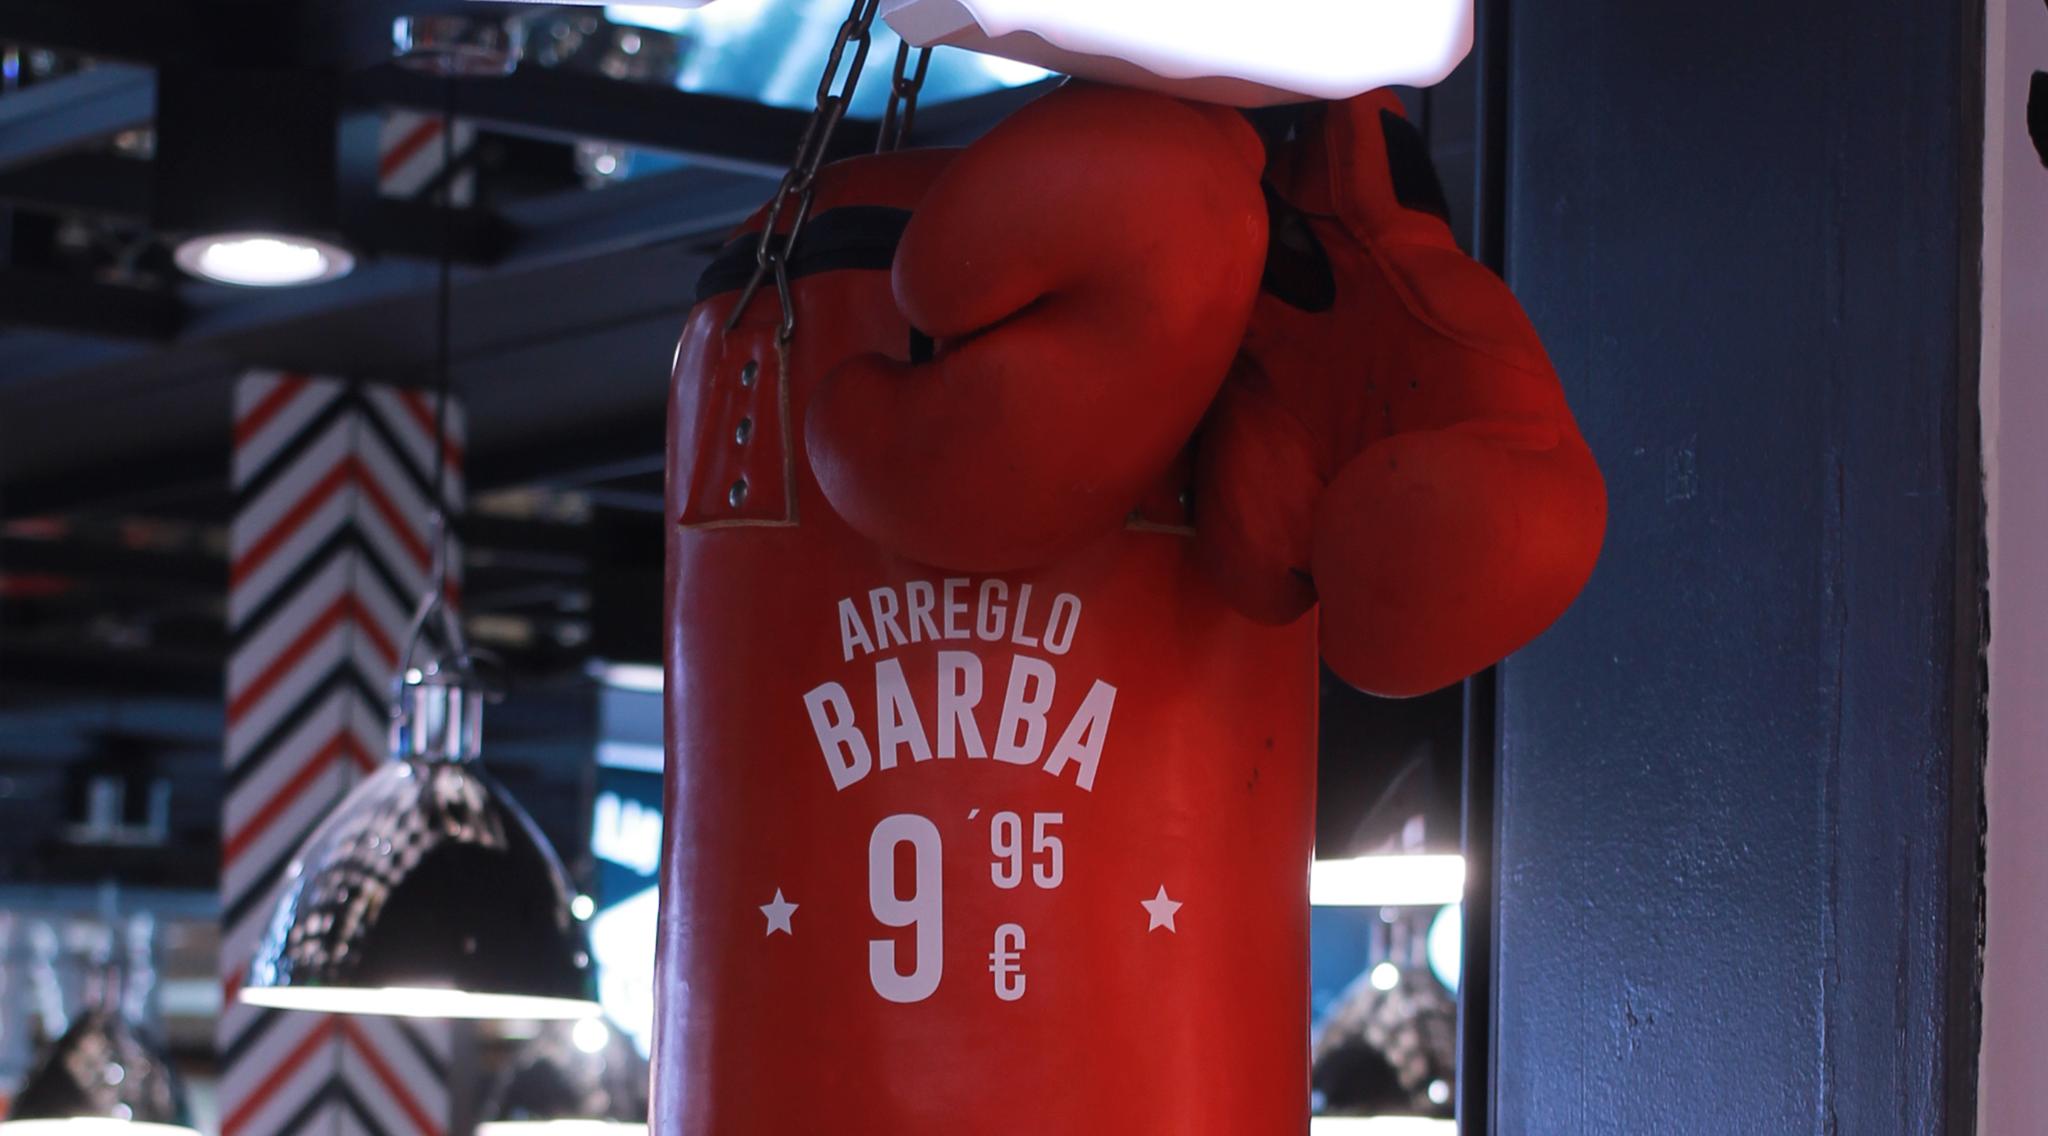 Barberia 8